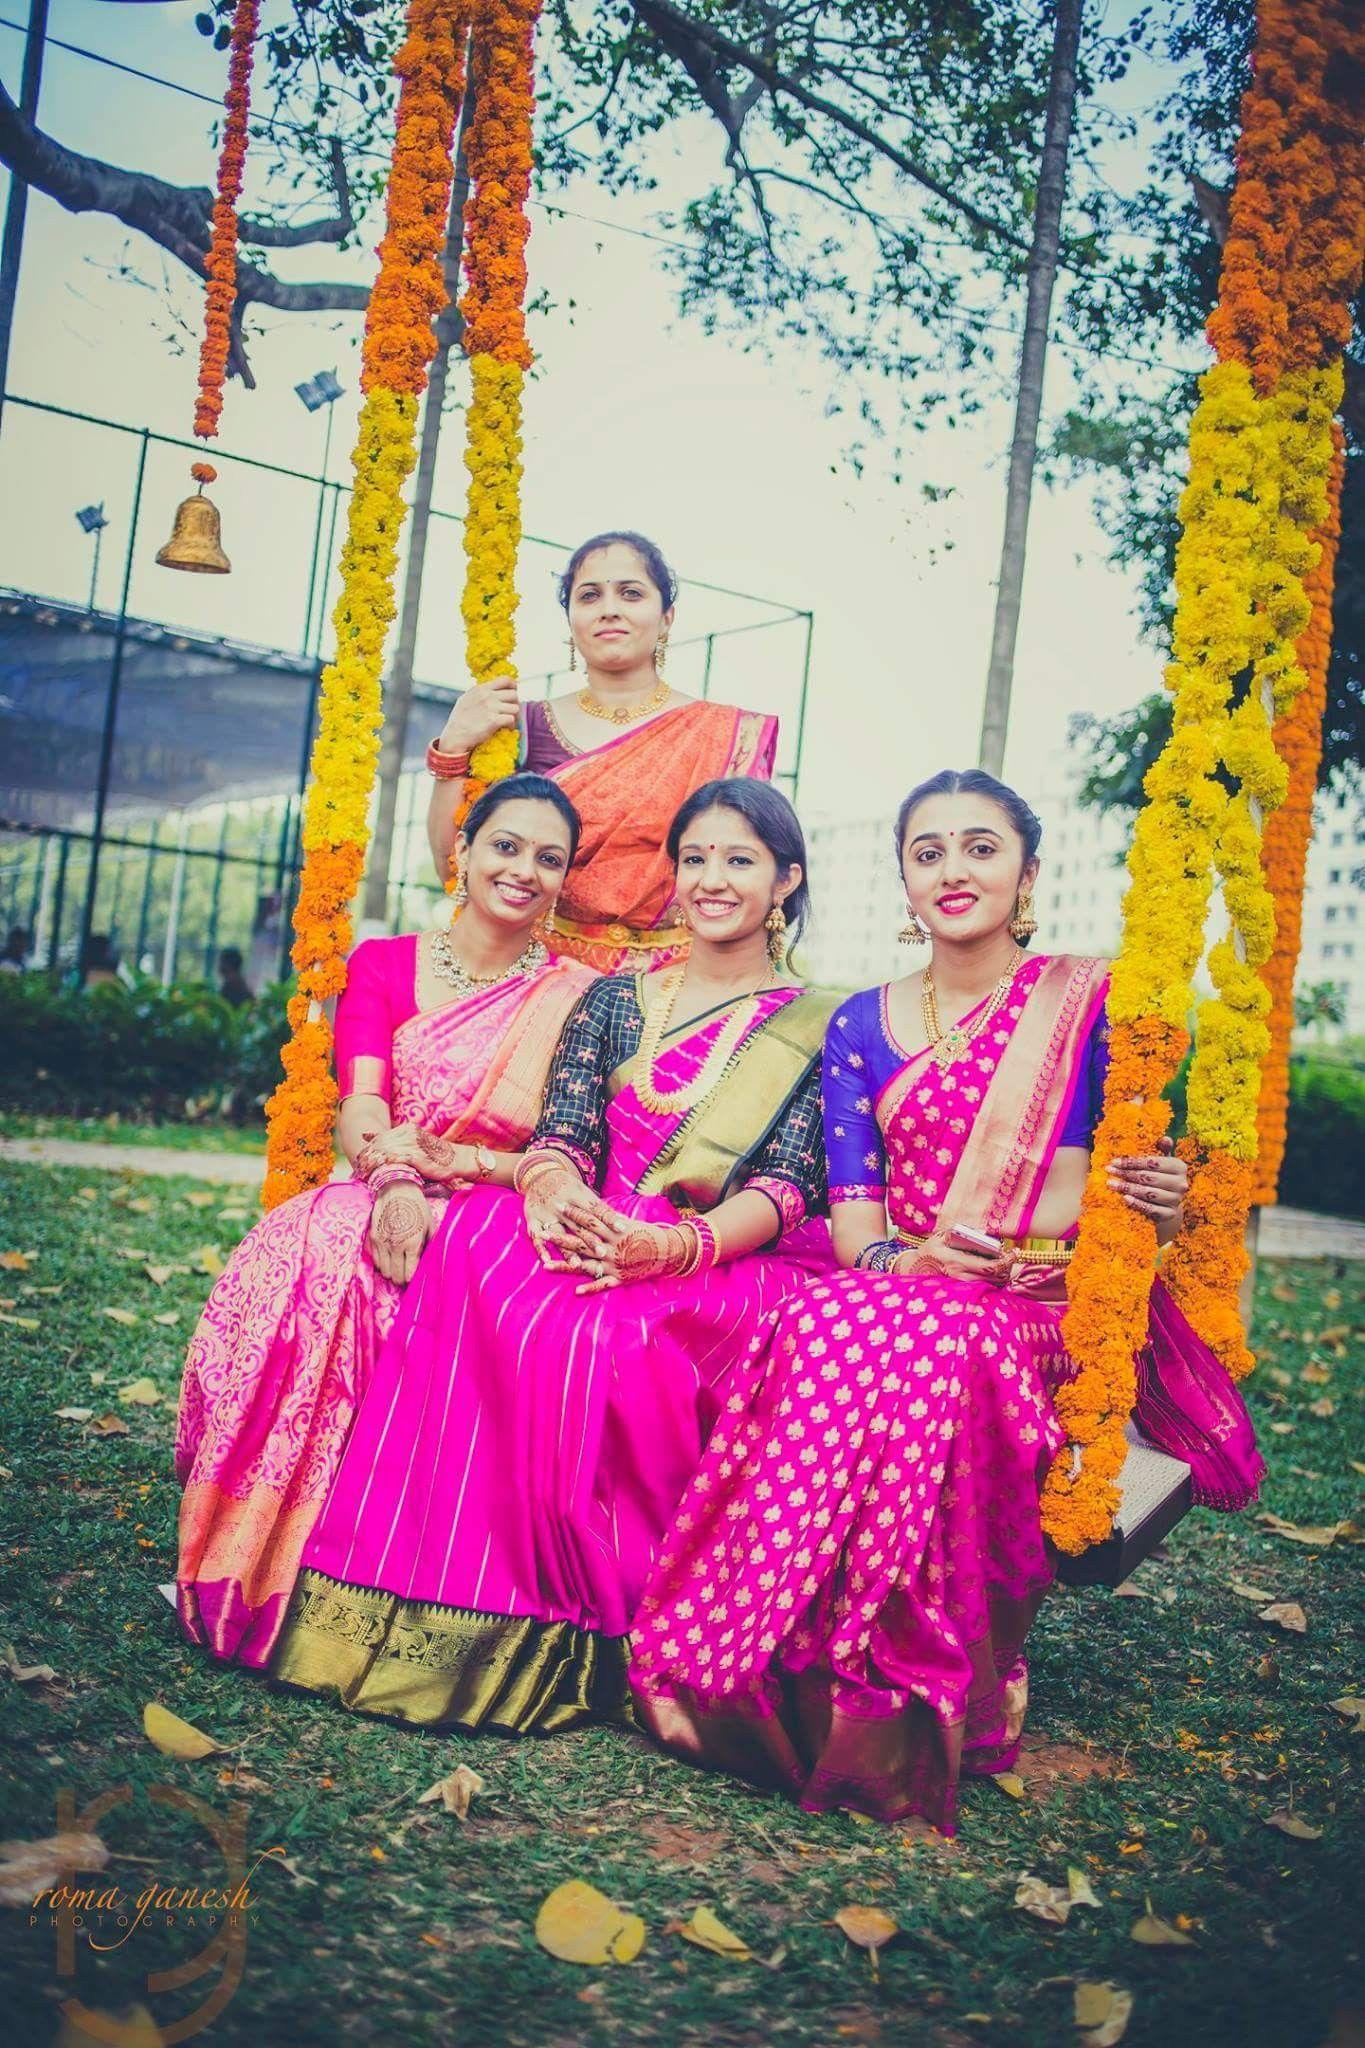 Pin de Chrishanthi Bernice D C en silky chic | Pinterest